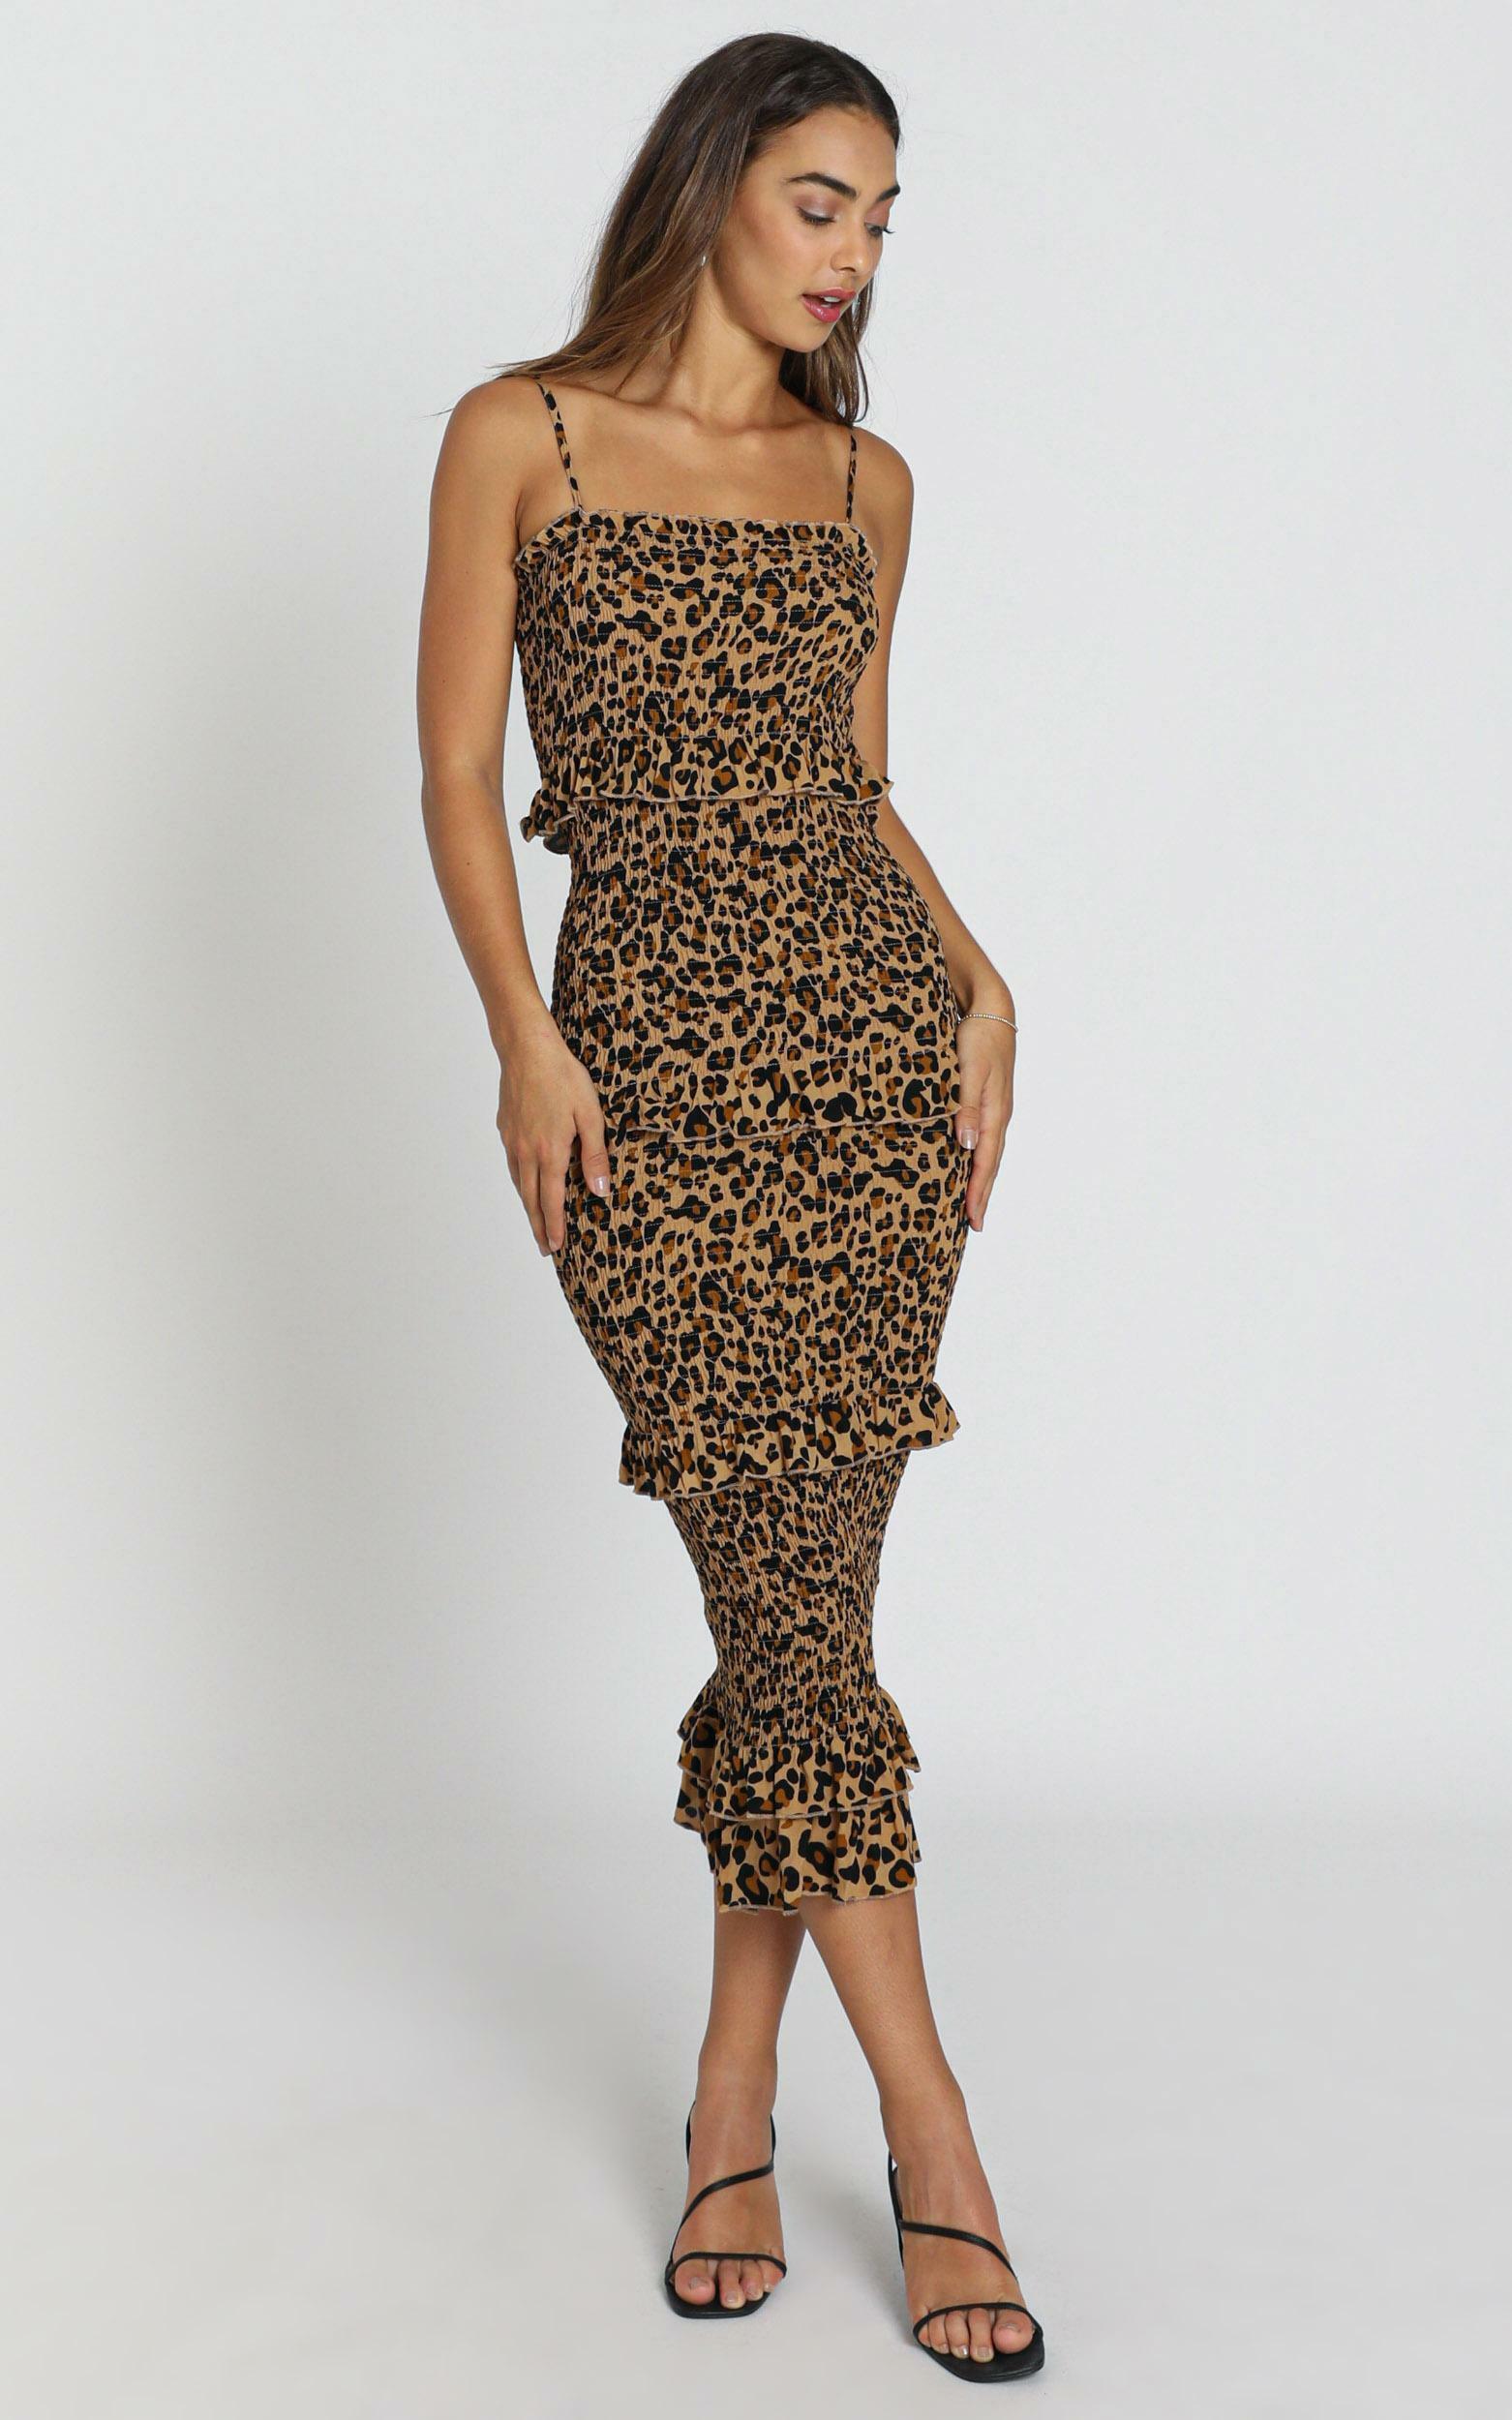 Chloe Dress in leopard print - 8 (S), Black, hi-res image number null